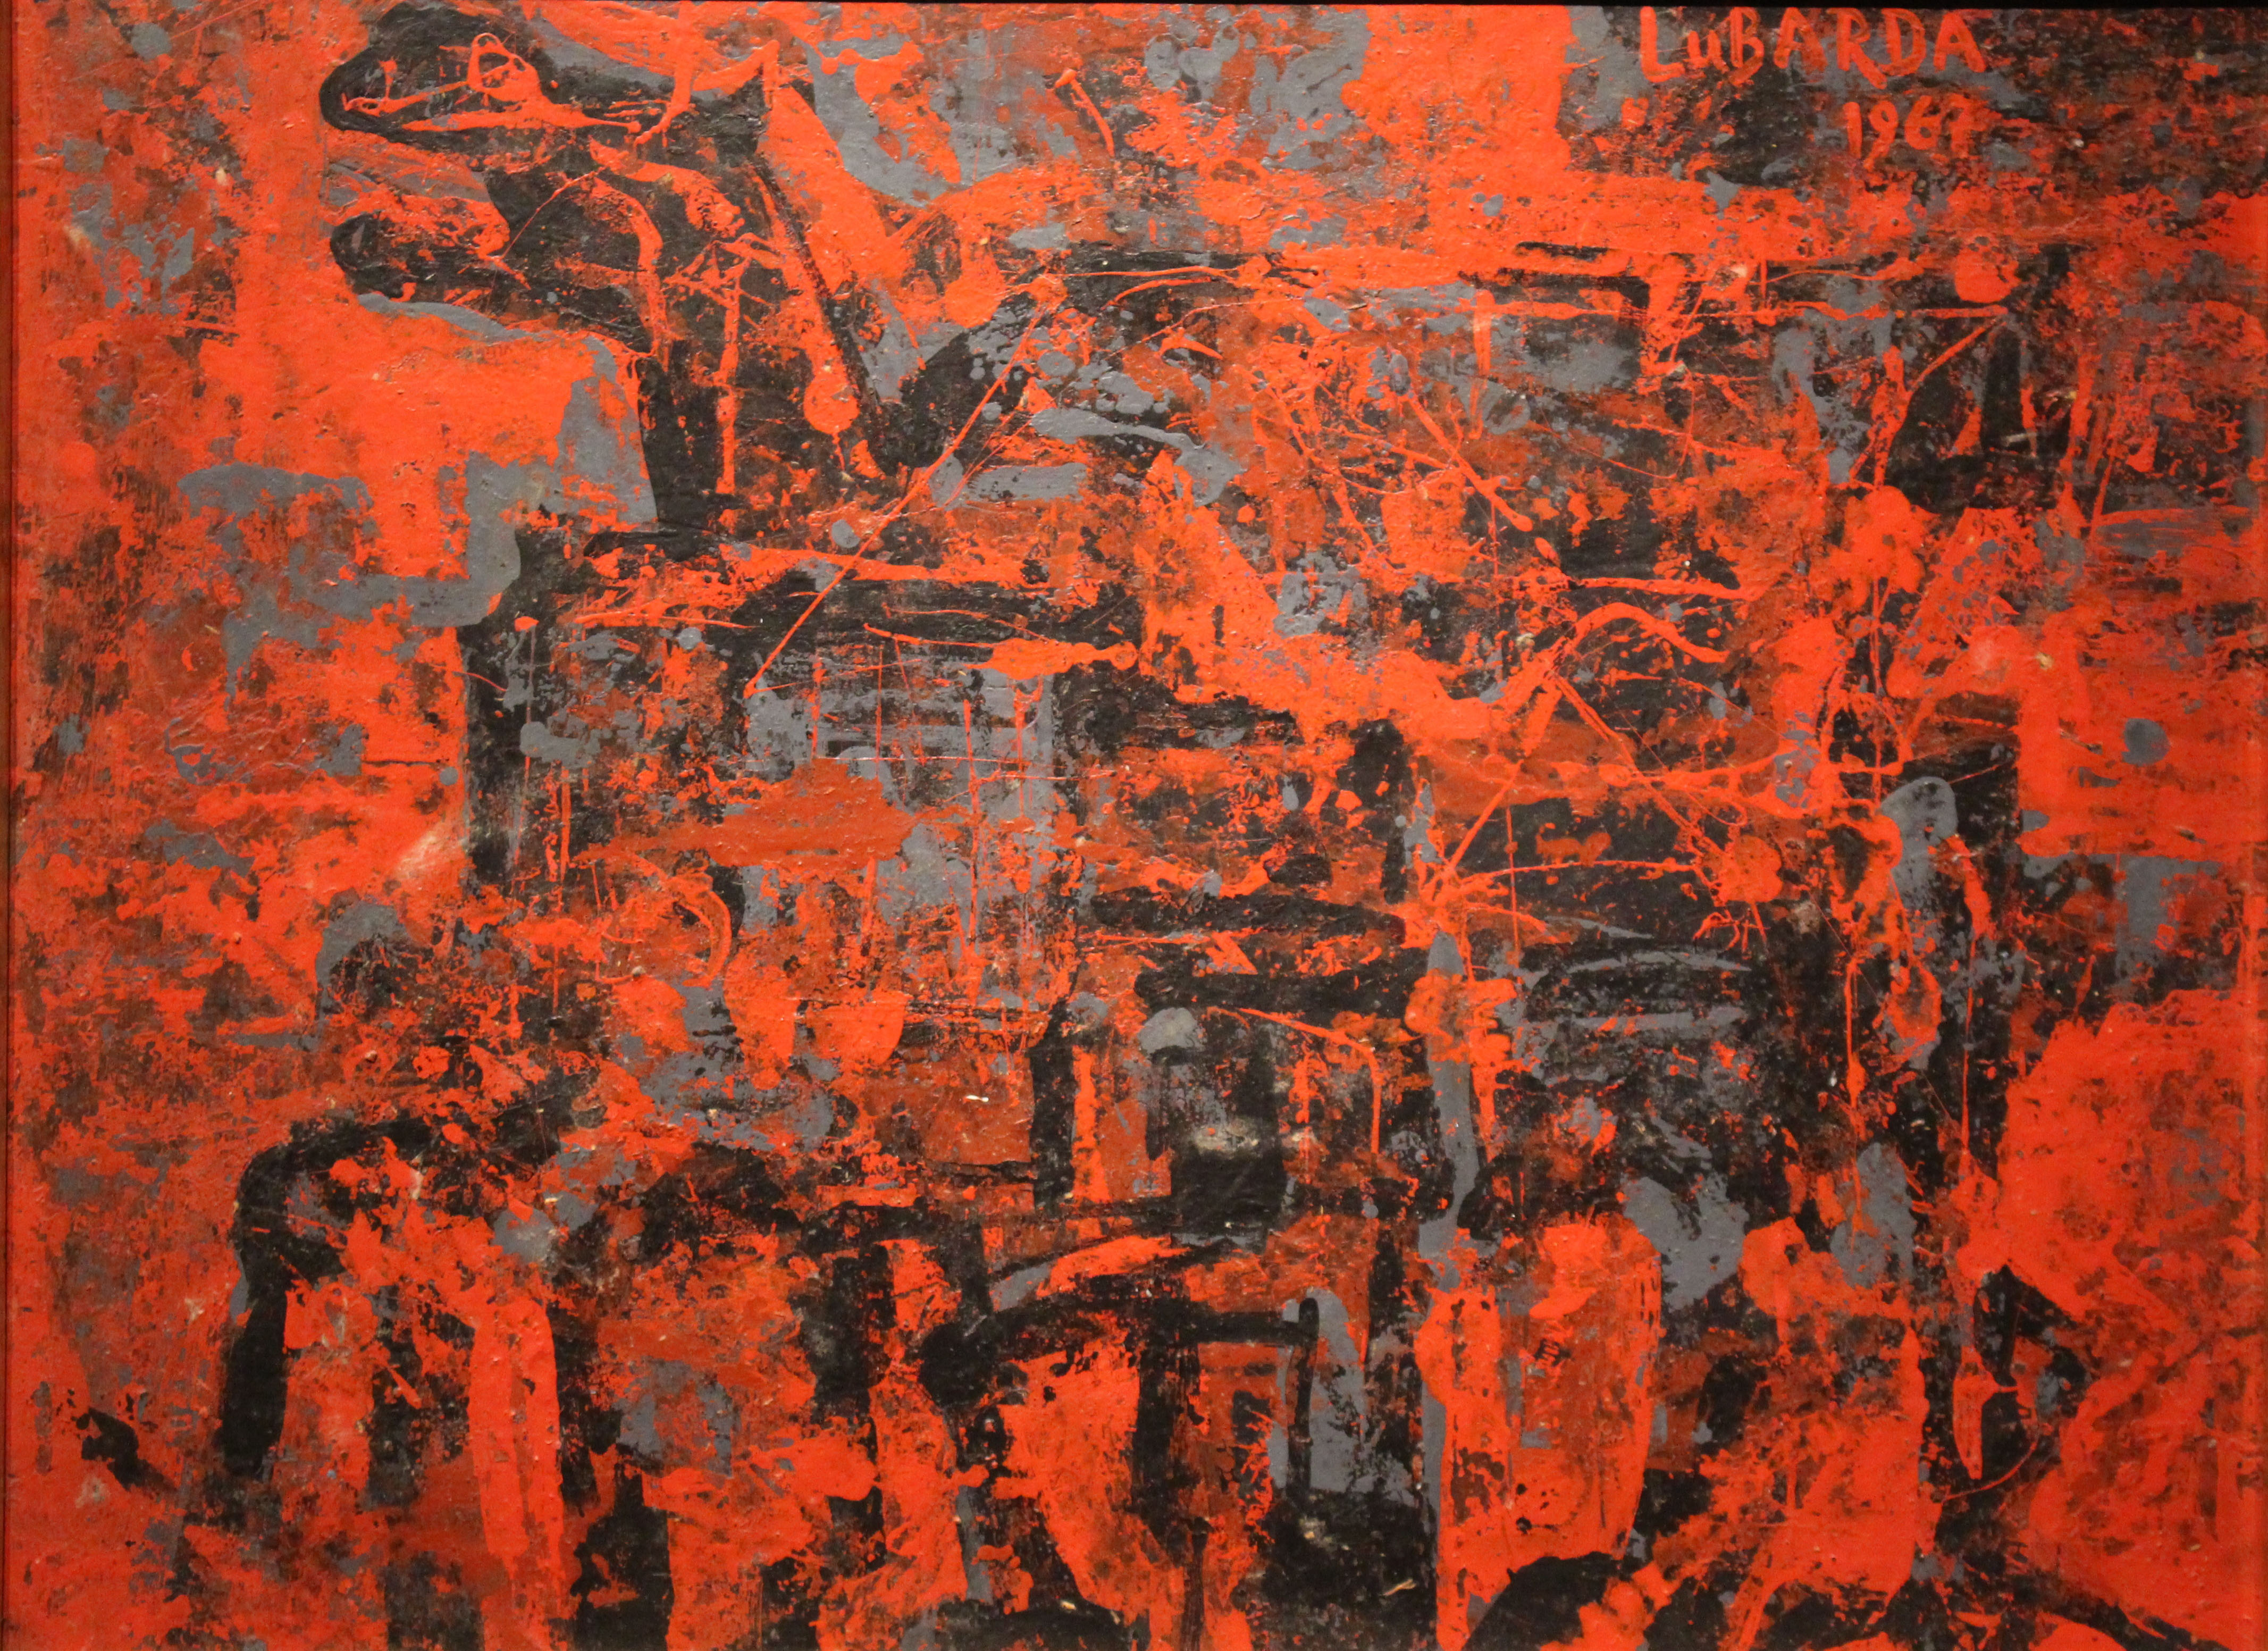 Petar Lubarda, Konjanik, ulje na lesonitu, 34,2x45,5 (1967)